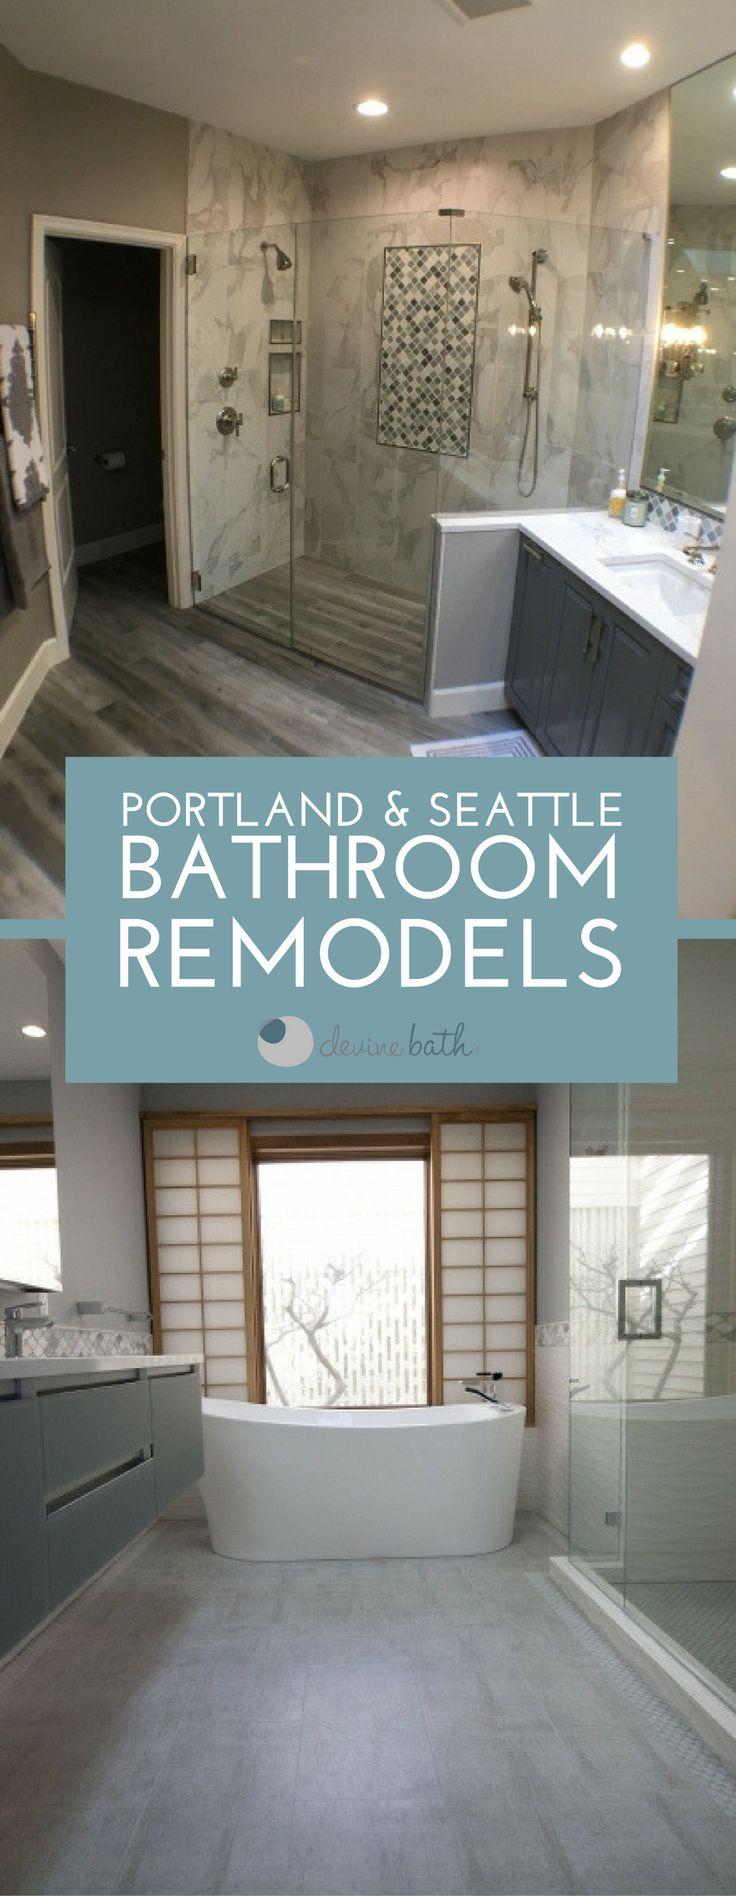 90 Best Devine Bath Bathroom Remodels Images On Pinterest  Bath Mesmerizing Bathroom Remodel Seattle Decorating Design